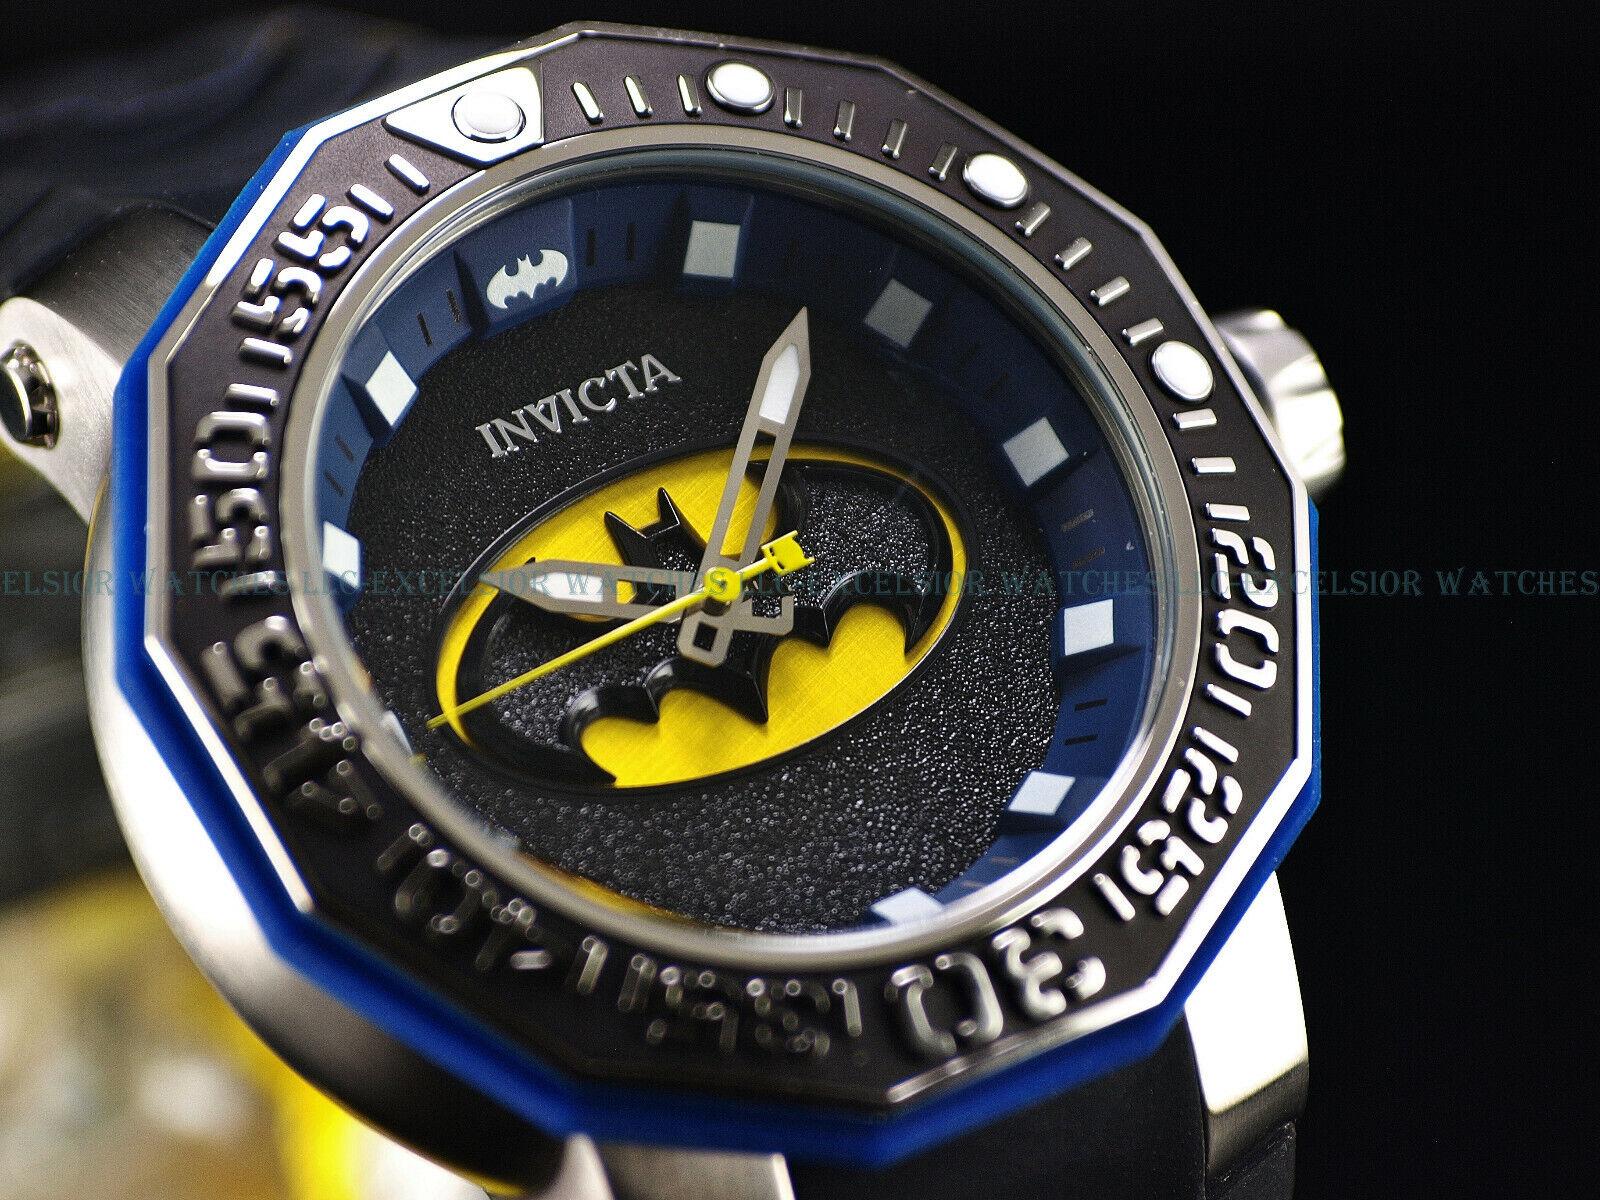 美國eBay代購第一品牌-樂淘letao-RARE! Invicta 52mm DC Comics BATMAN Sea Monster Limtd Ed Automatic Strap watch